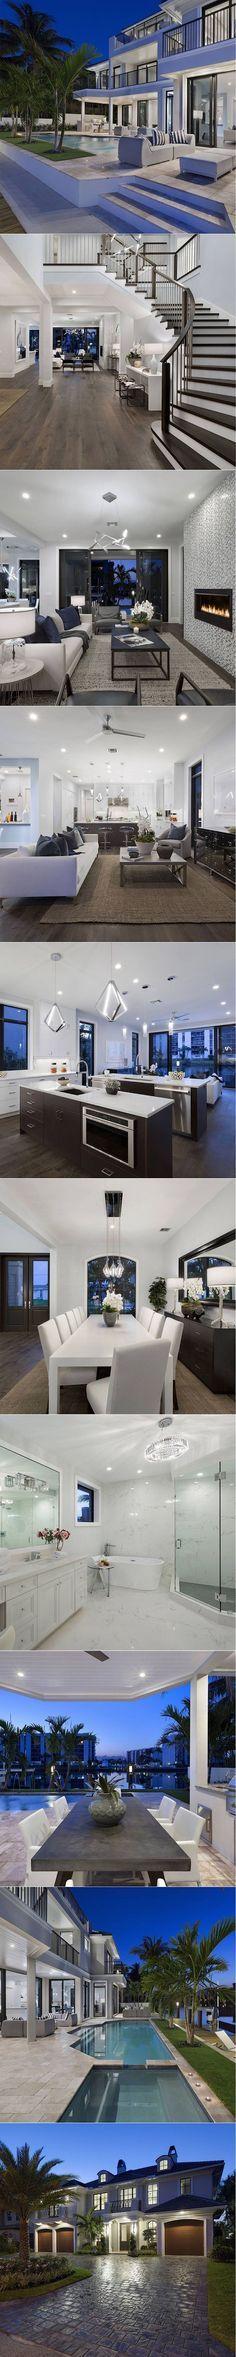 Boca Raton Mansion Walkthrough Yessss please! Villa Plan, Modern Mansion, House Goals, Luxurious Bedrooms, My Dream Home, Dream Homes, Luxury Homes, Luxury Estate, Luxury Lifestyle